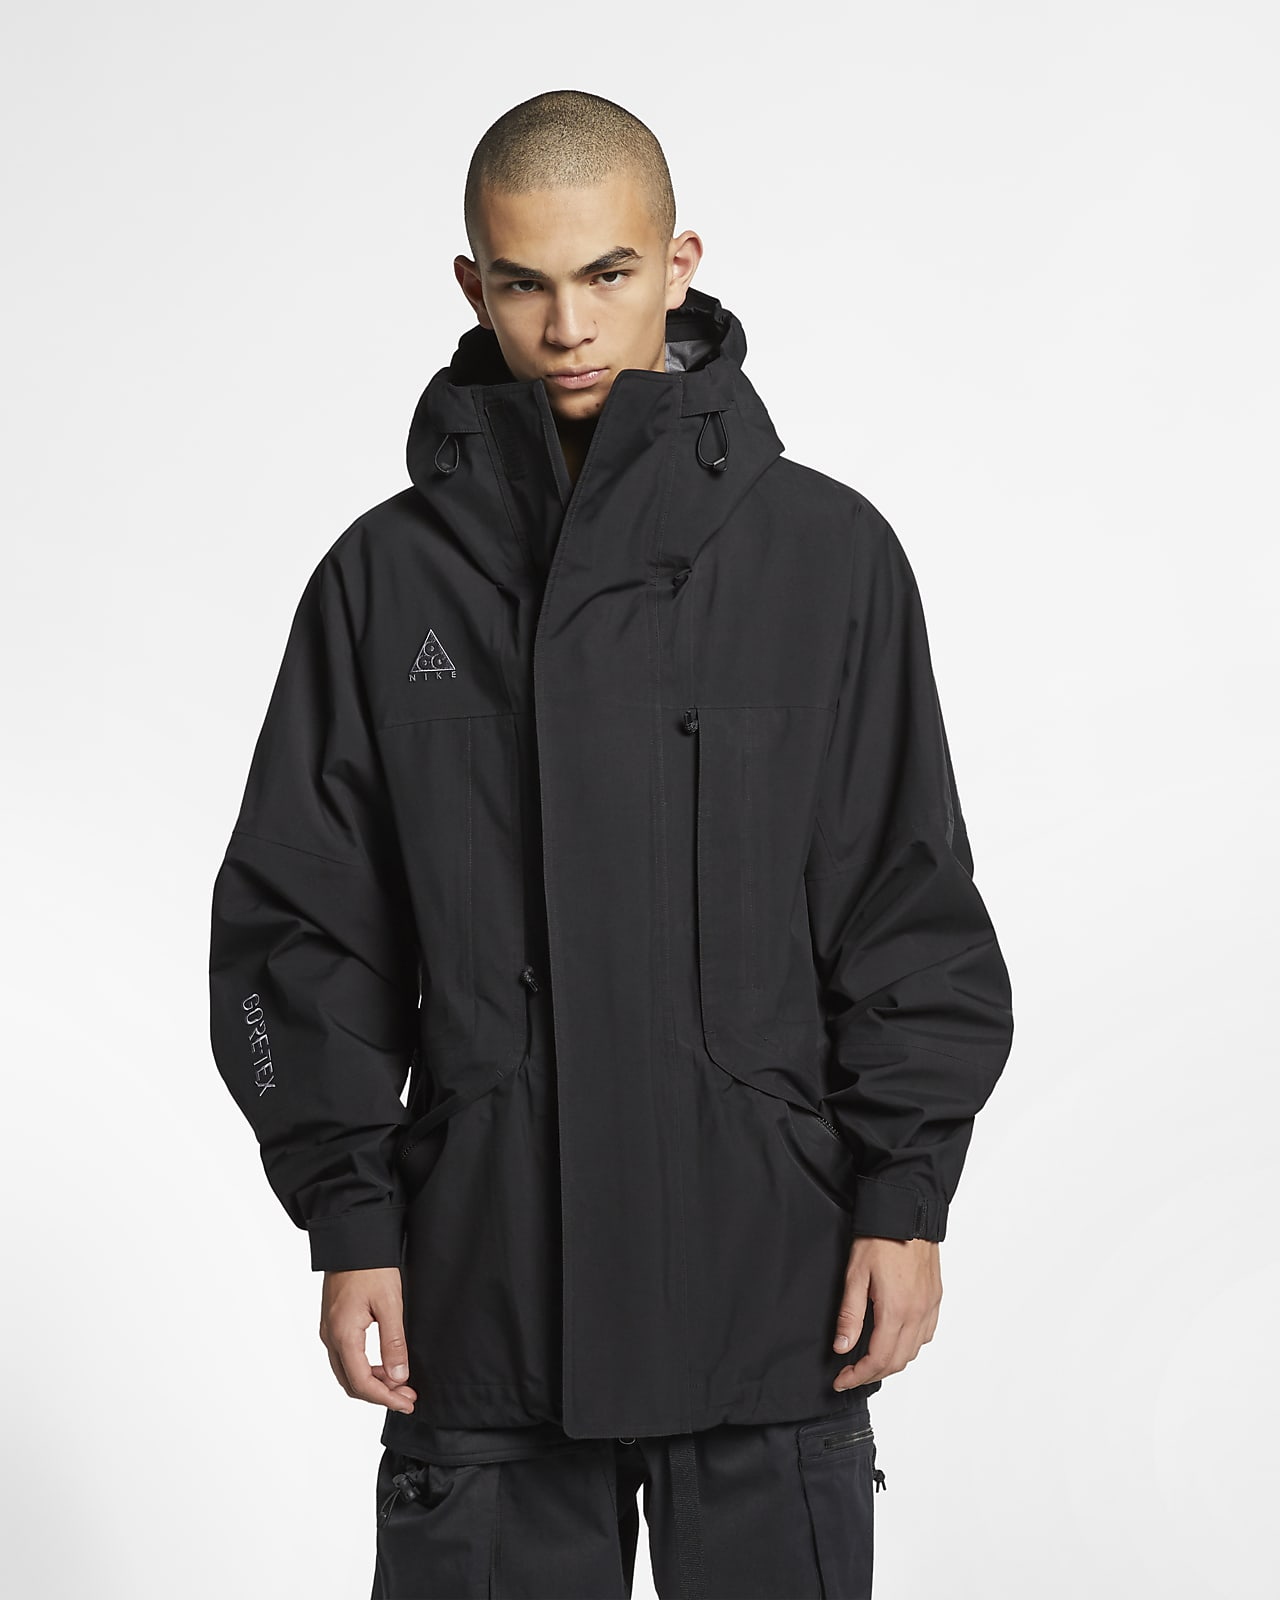 Nike ACG GORE-TEX ® Jacket